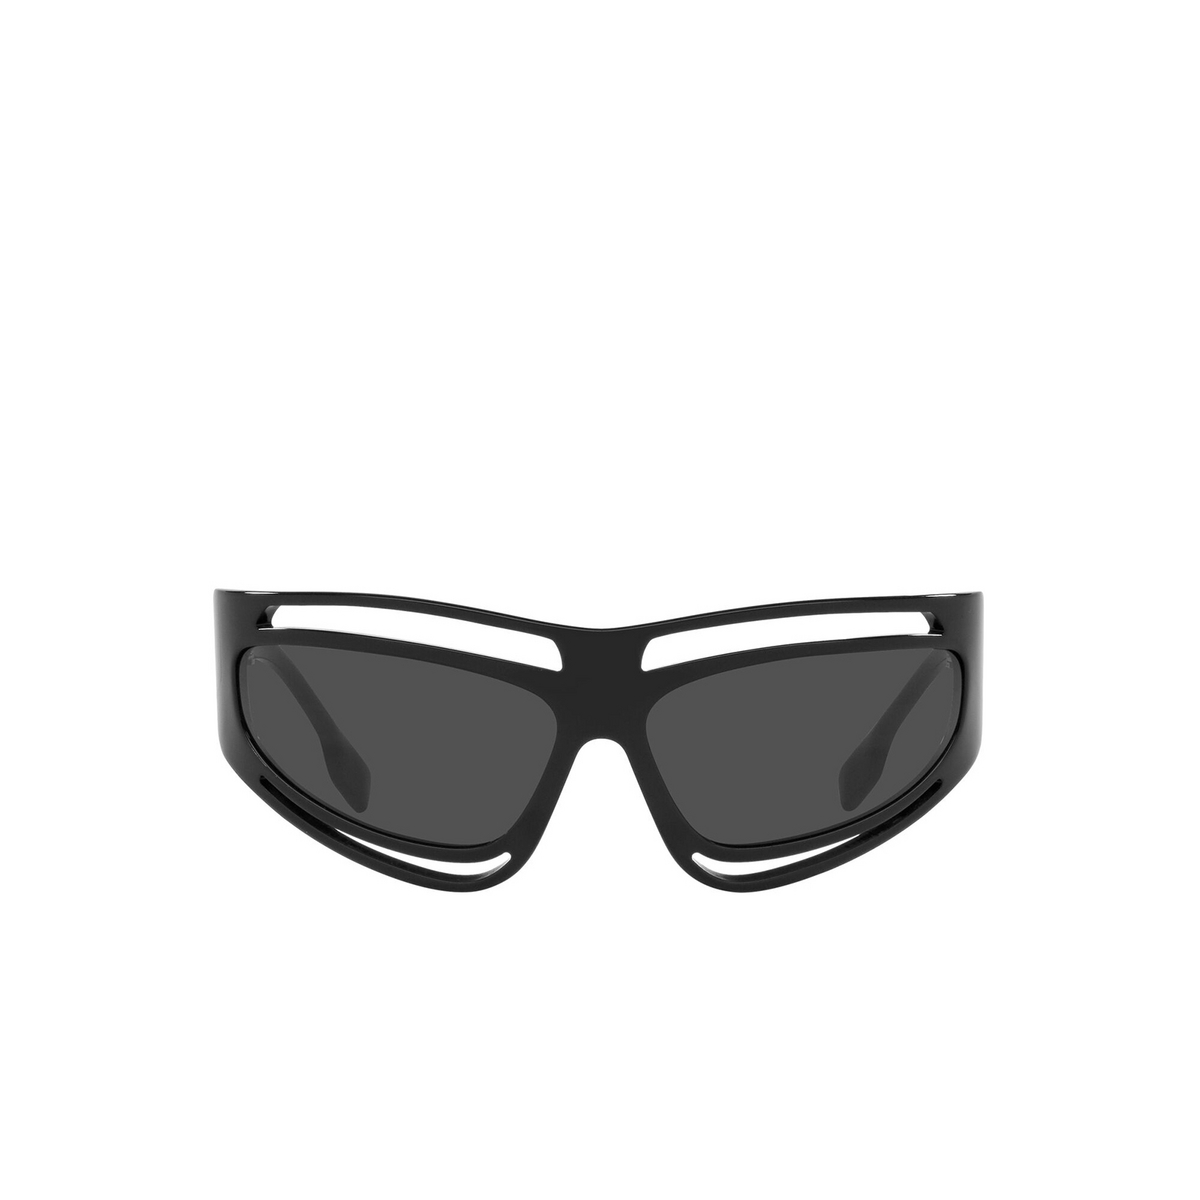 Burberry® Sport Sunglasses: BE4342 color Black 300187 - front view.